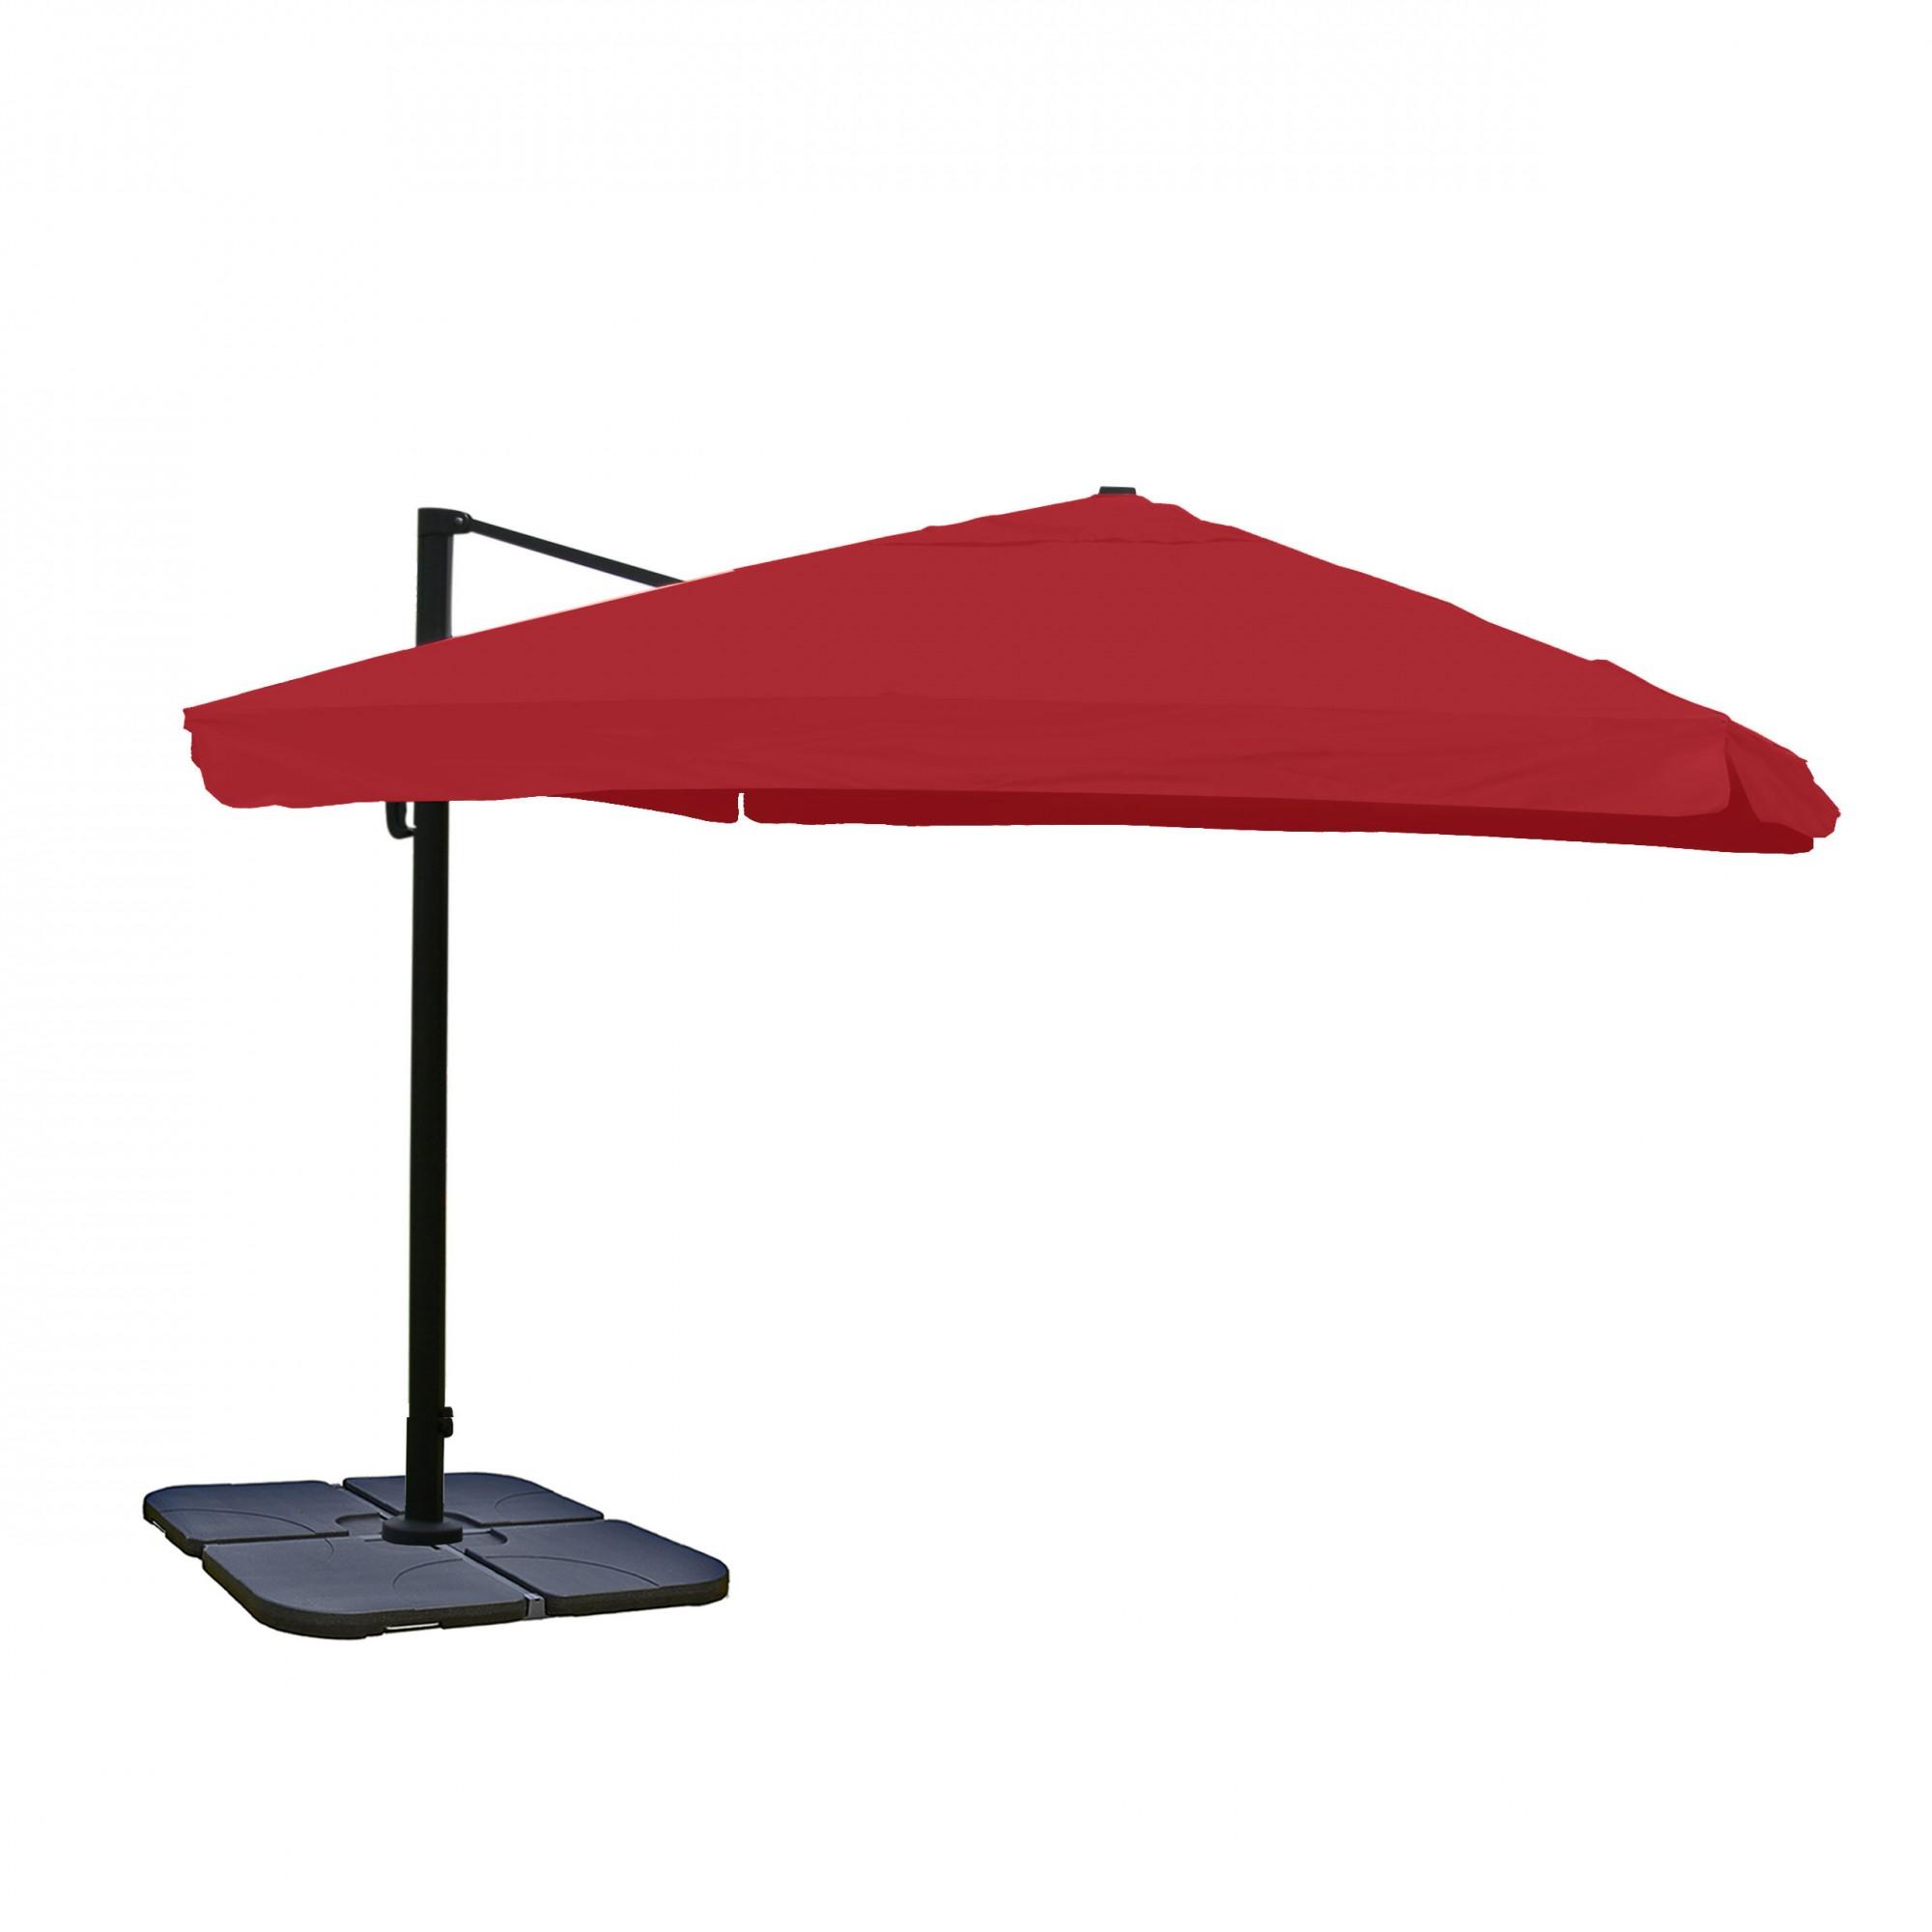 alu gastronomie luxus ampelschirm sonnenschirm 4 3 m bordeaux mit st nder garten sonnenschirme. Black Bedroom Furniture Sets. Home Design Ideas